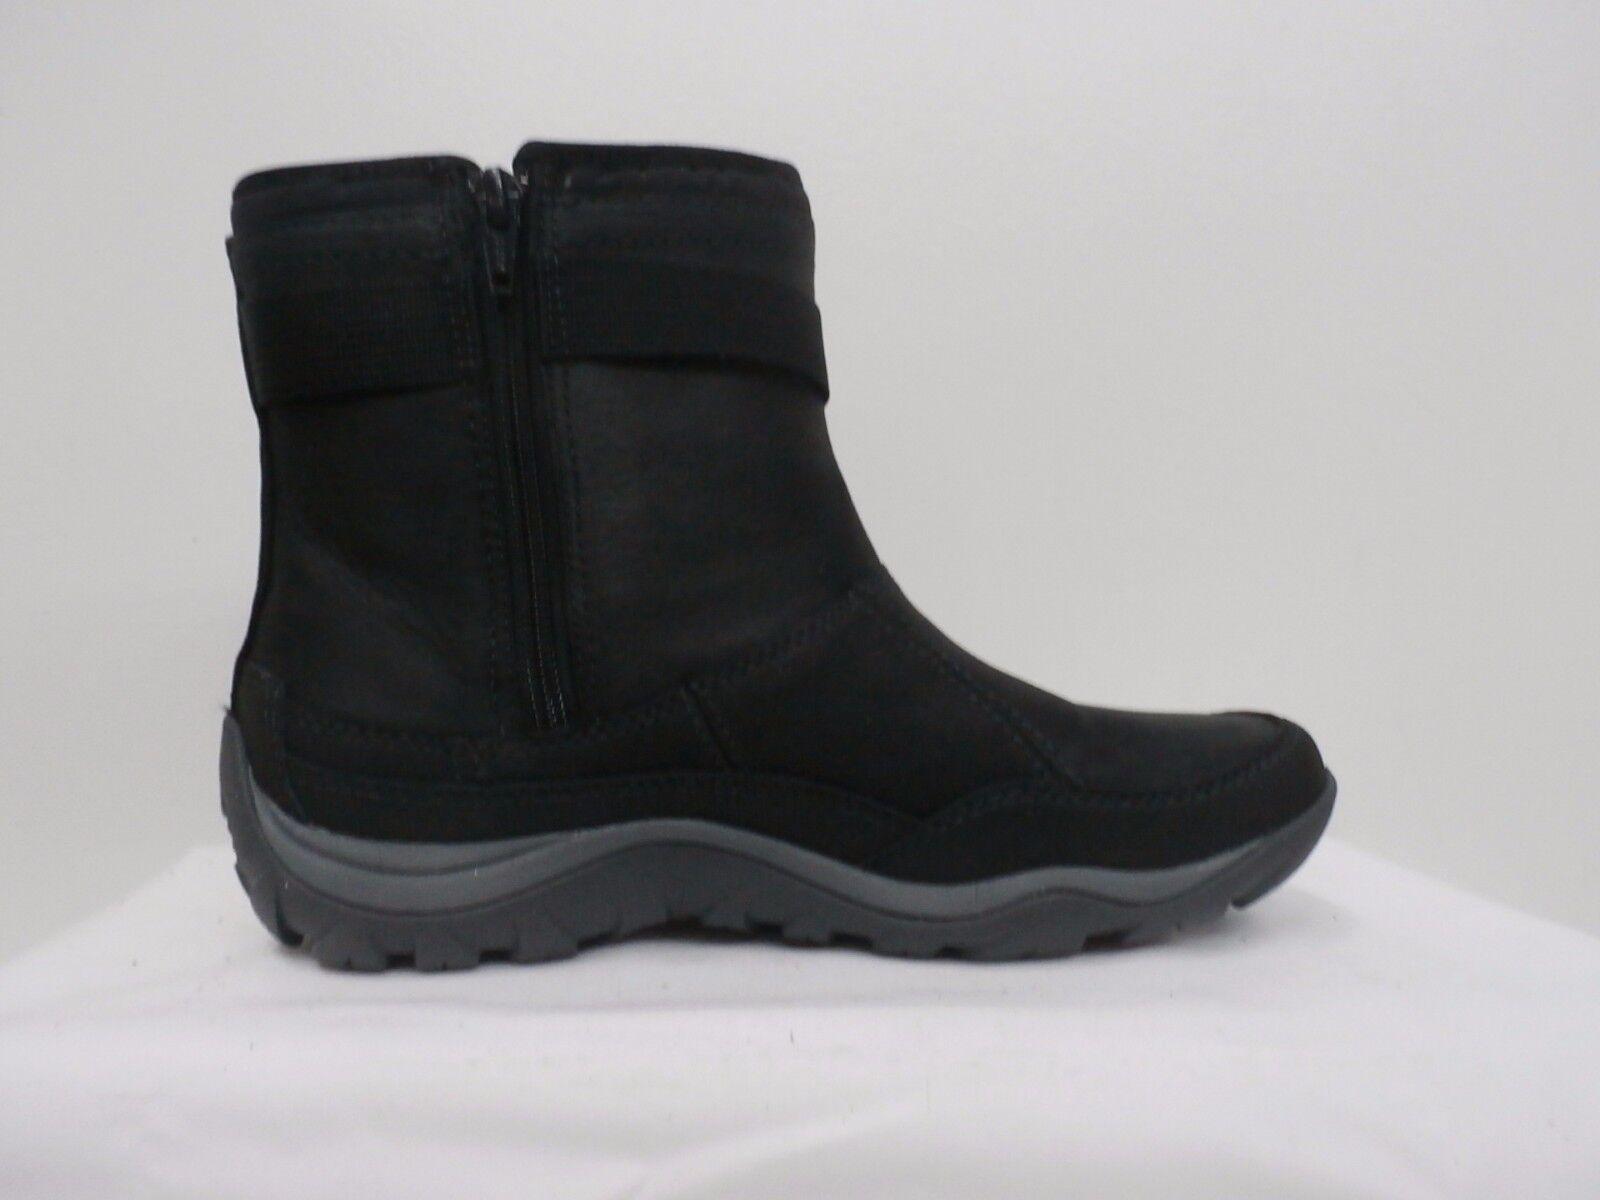 Merrell Waterproof Leather Ankle Boots - Murren Strap black Size 6